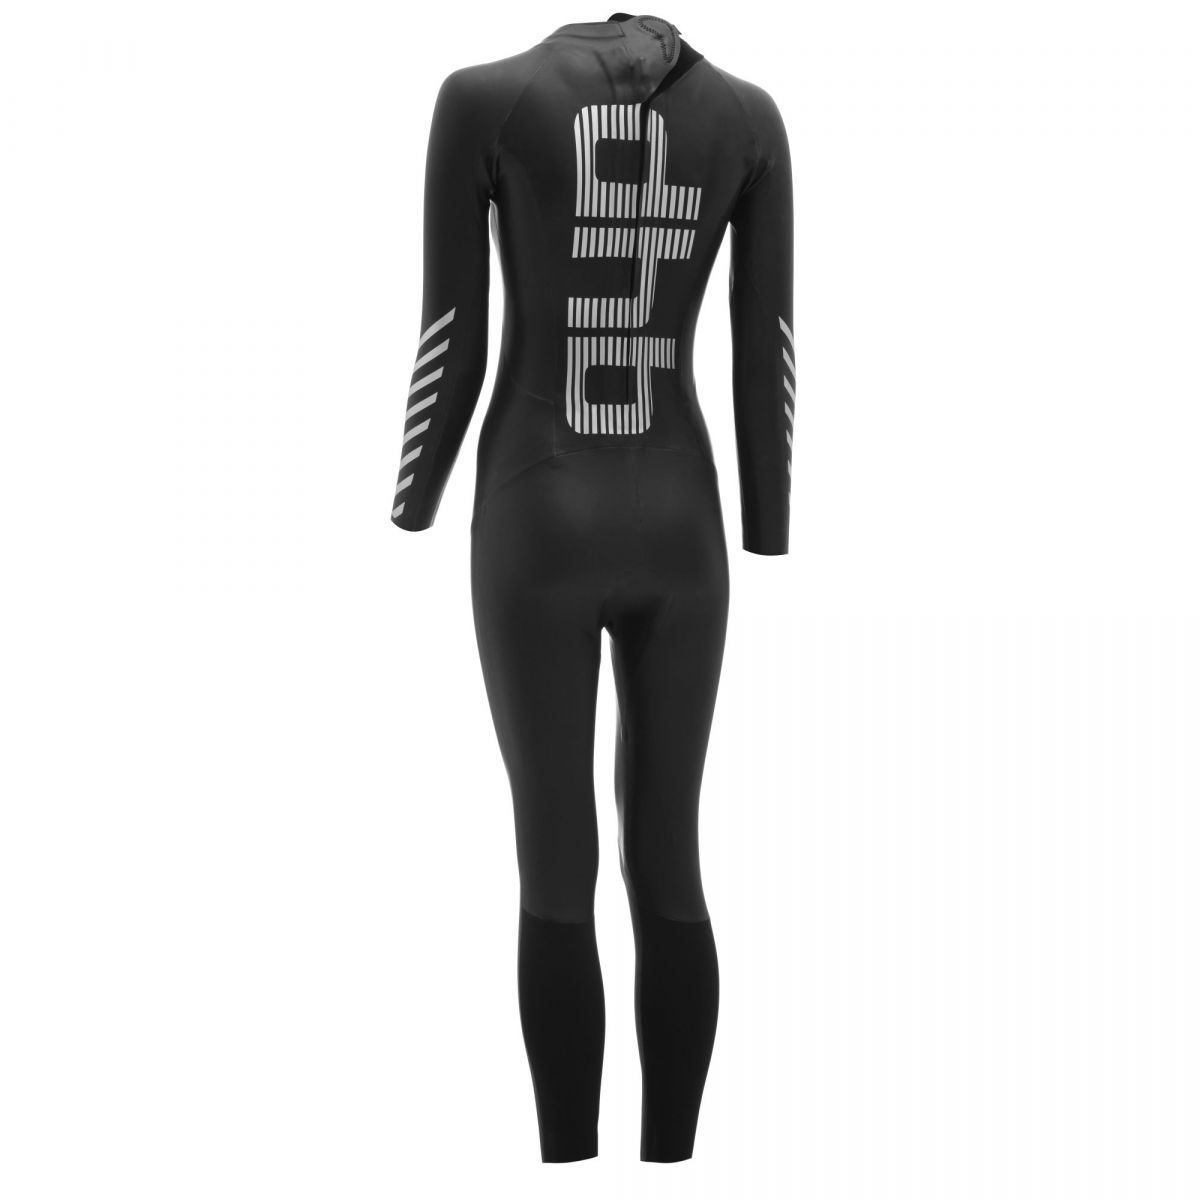 dhb-Hydron-Wetsuit-women-back